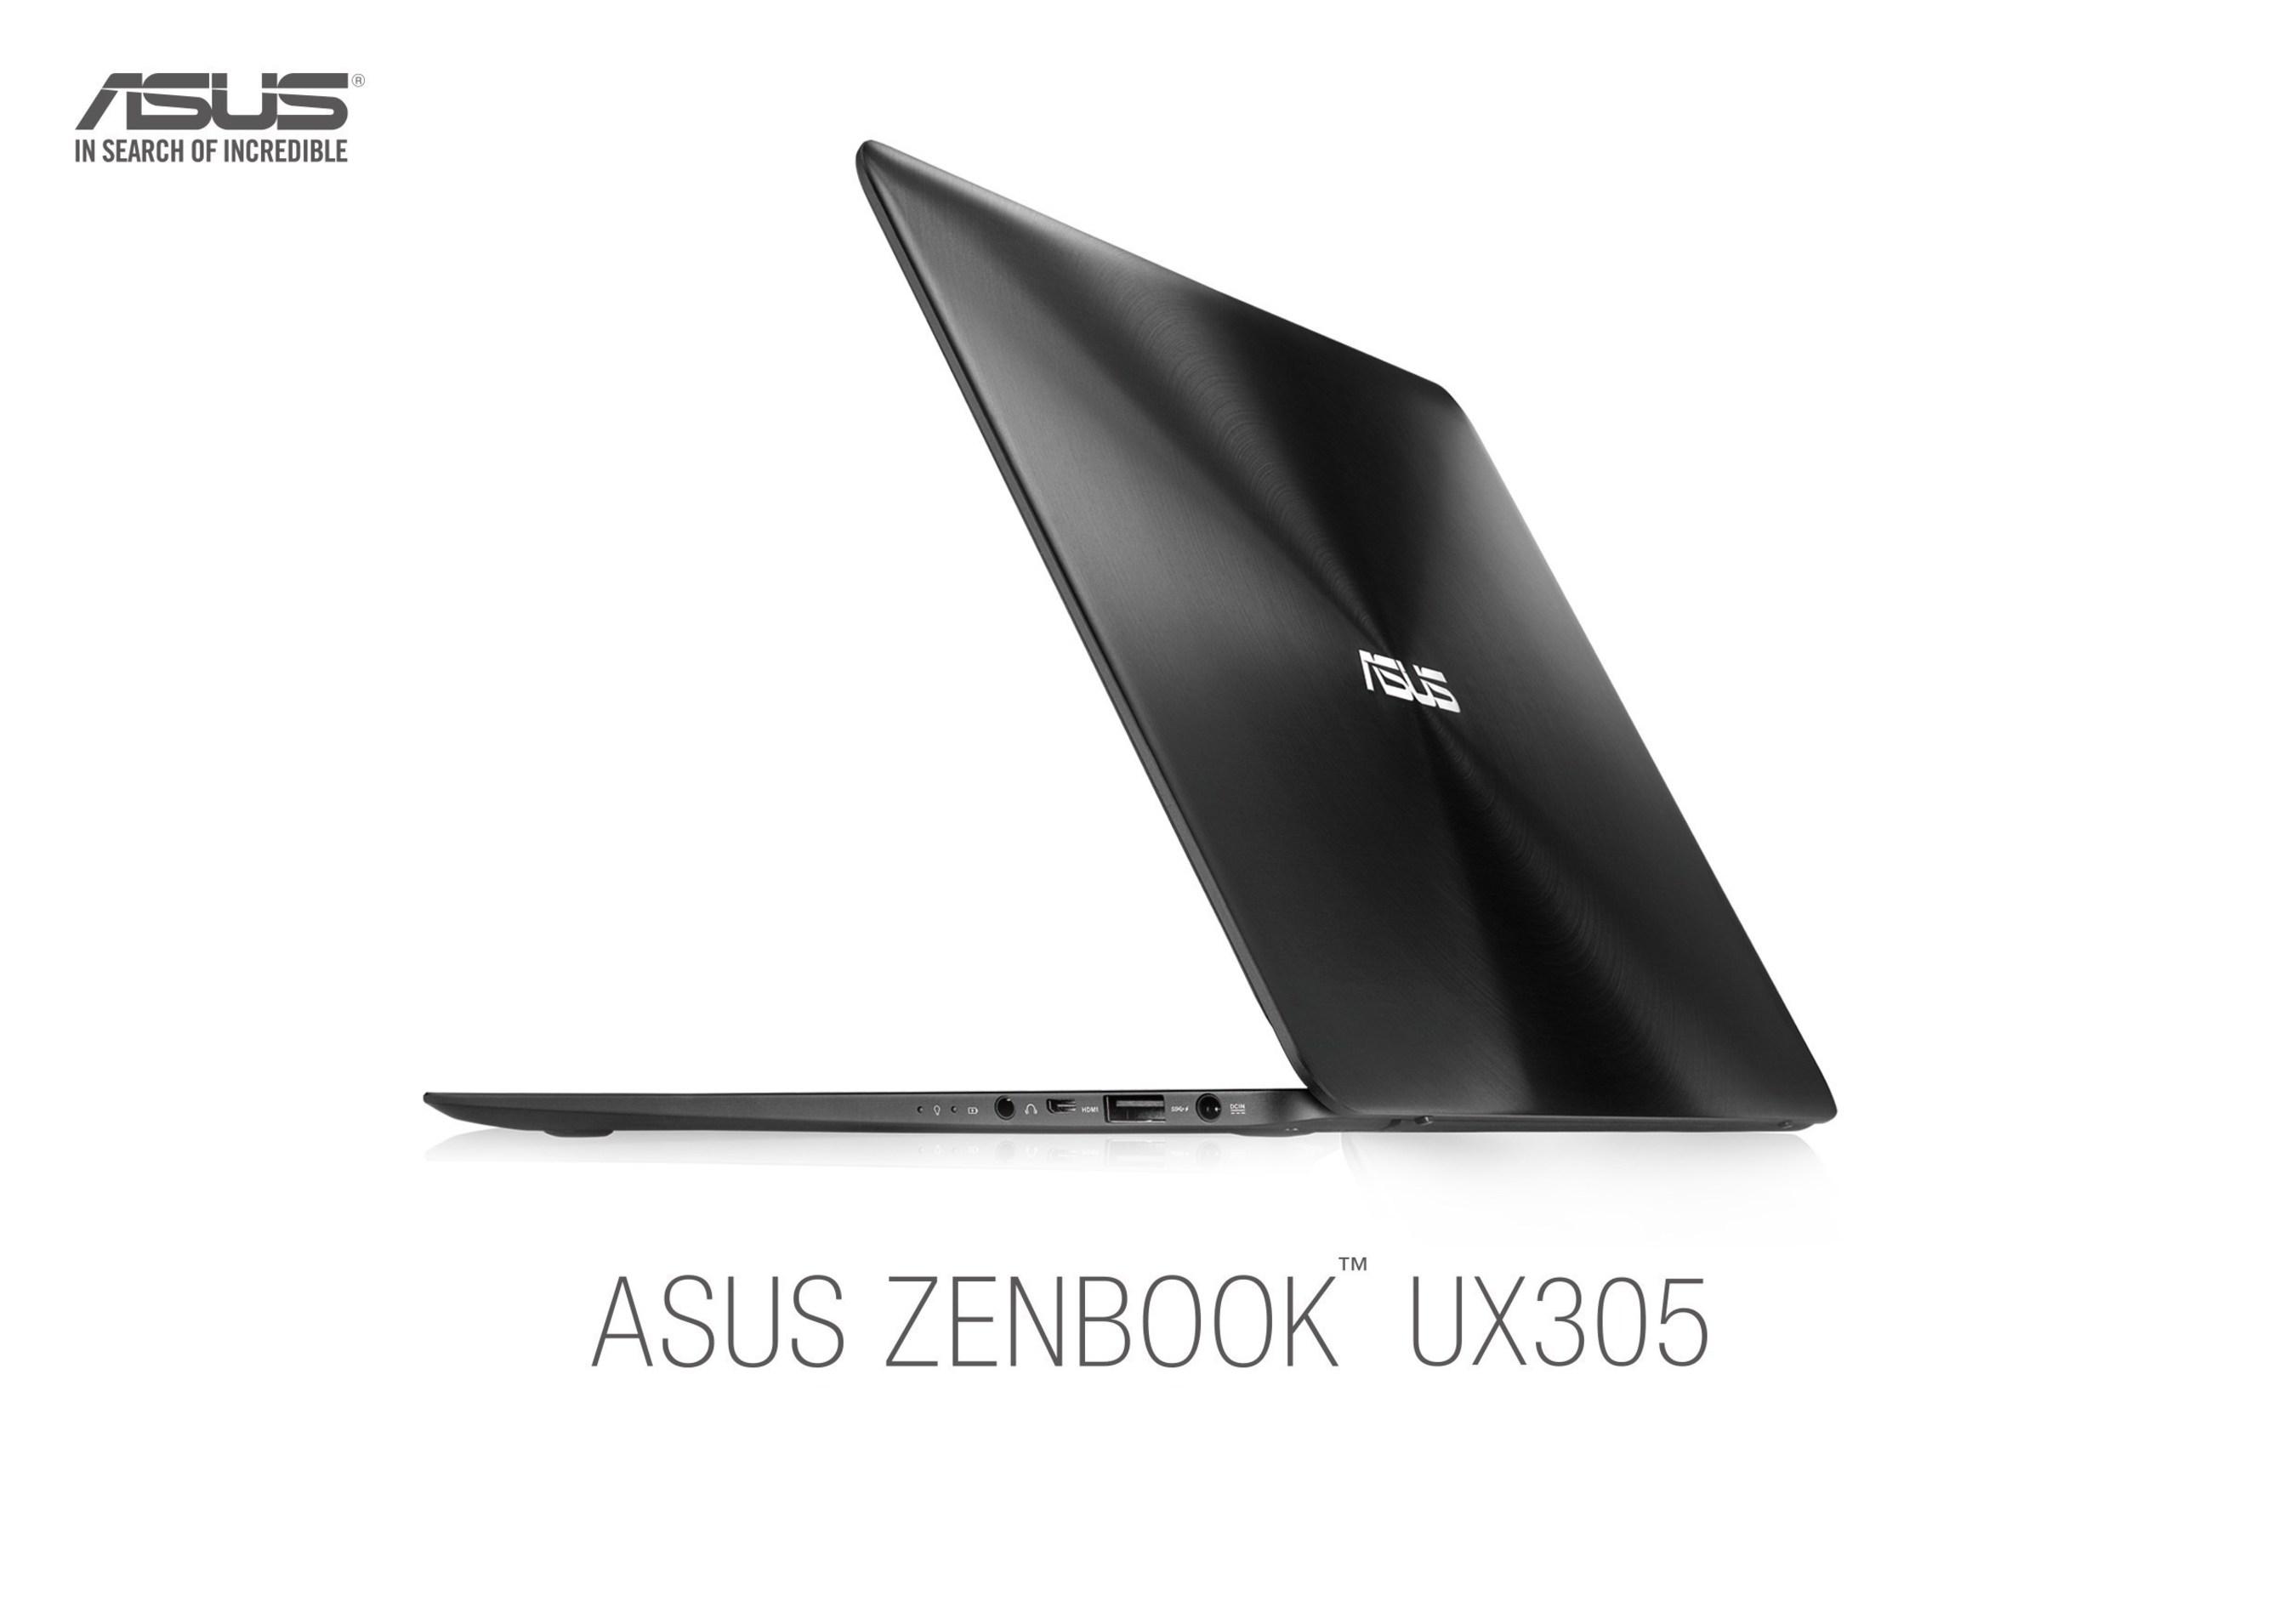 ASUS Announces ZenBook UX305 Ultrabook Starting at $699